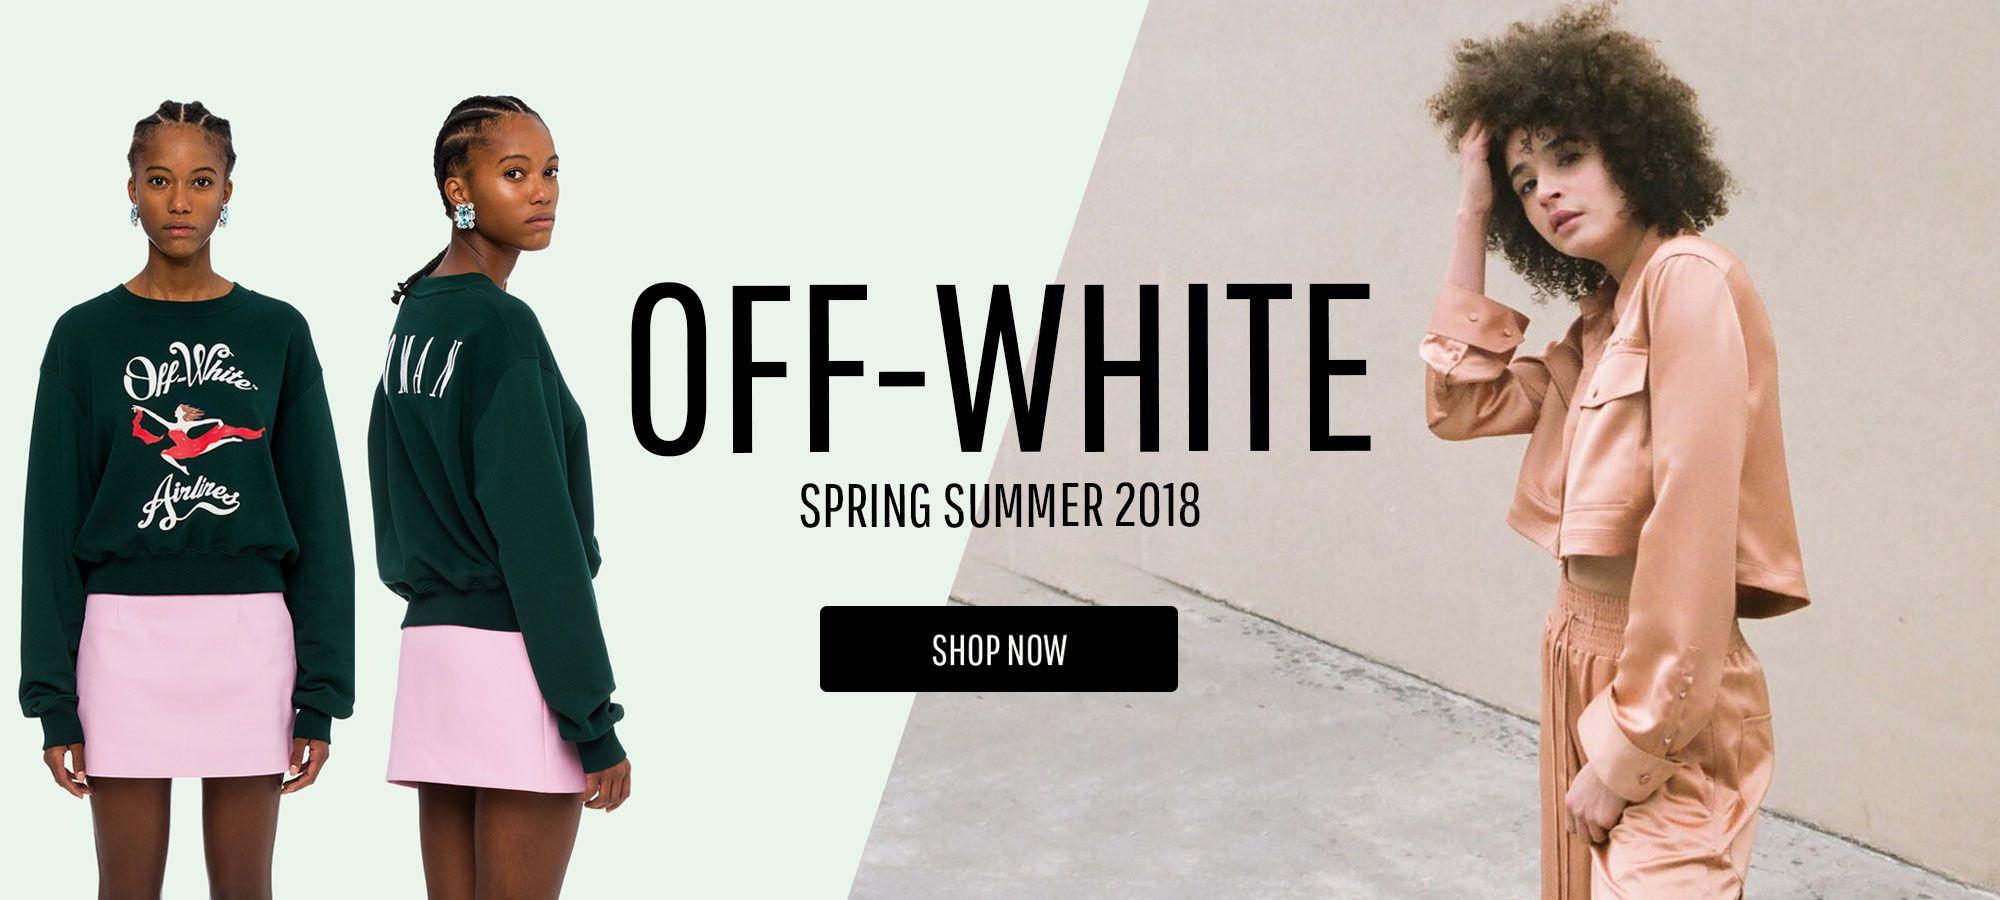 Off-White Women - Spring Summer 2018